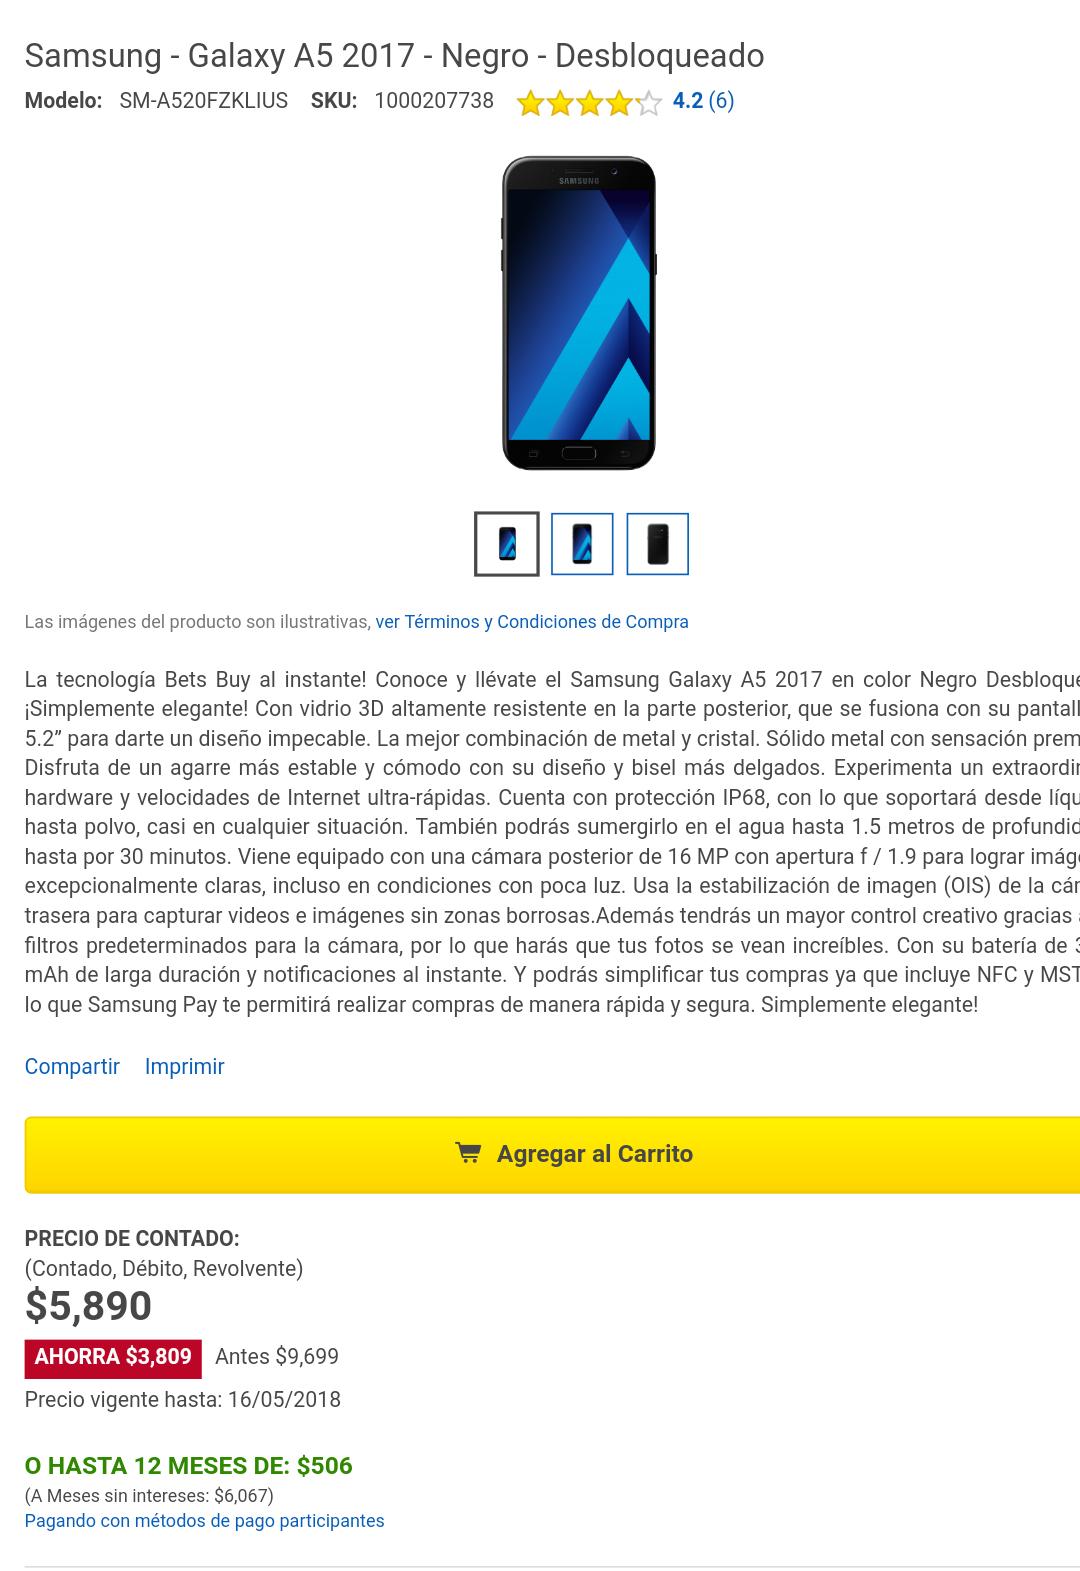 Samsung Galaxy A5 2017 Desbloqueado